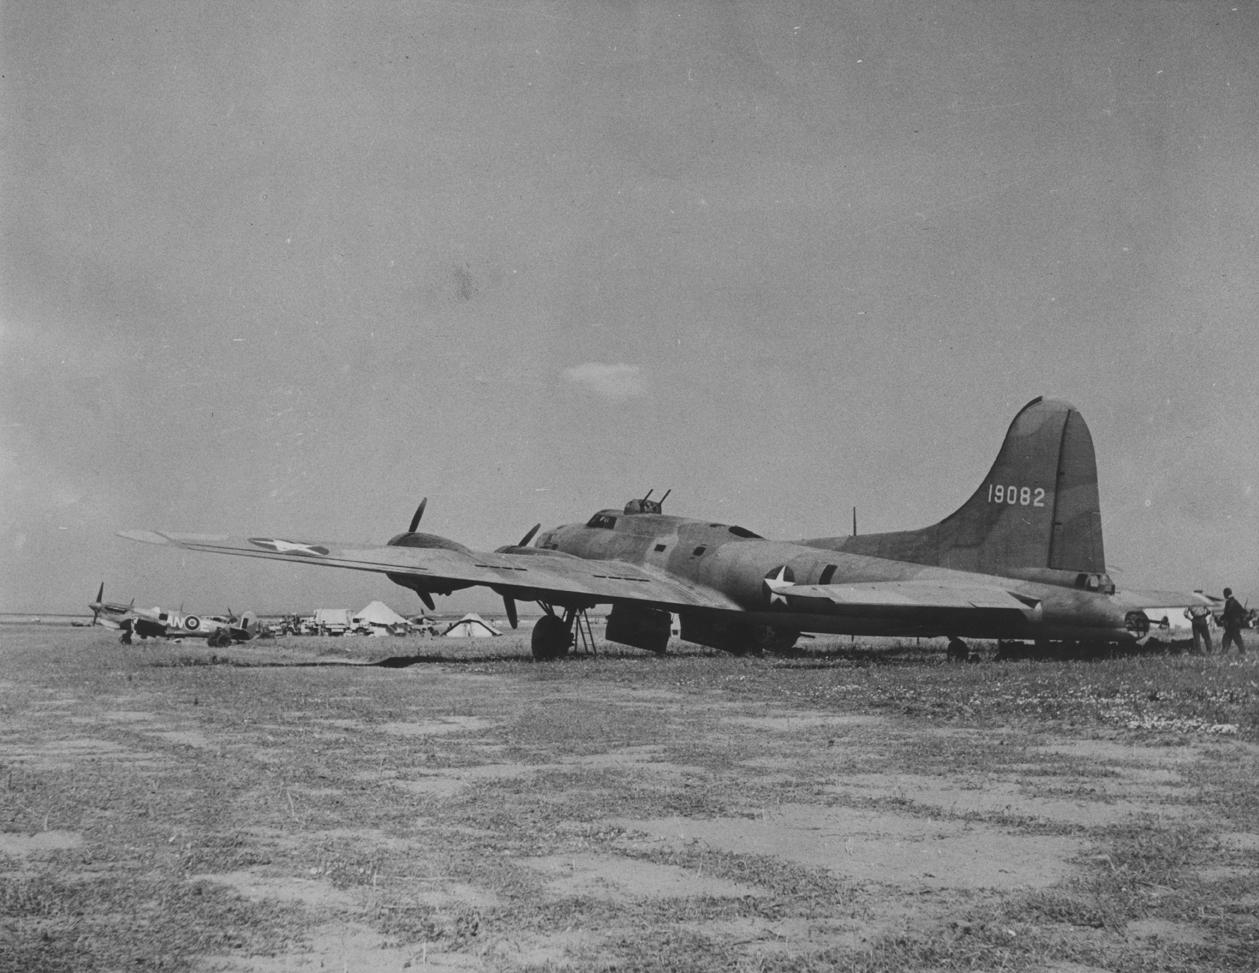 B-17 #41-9082